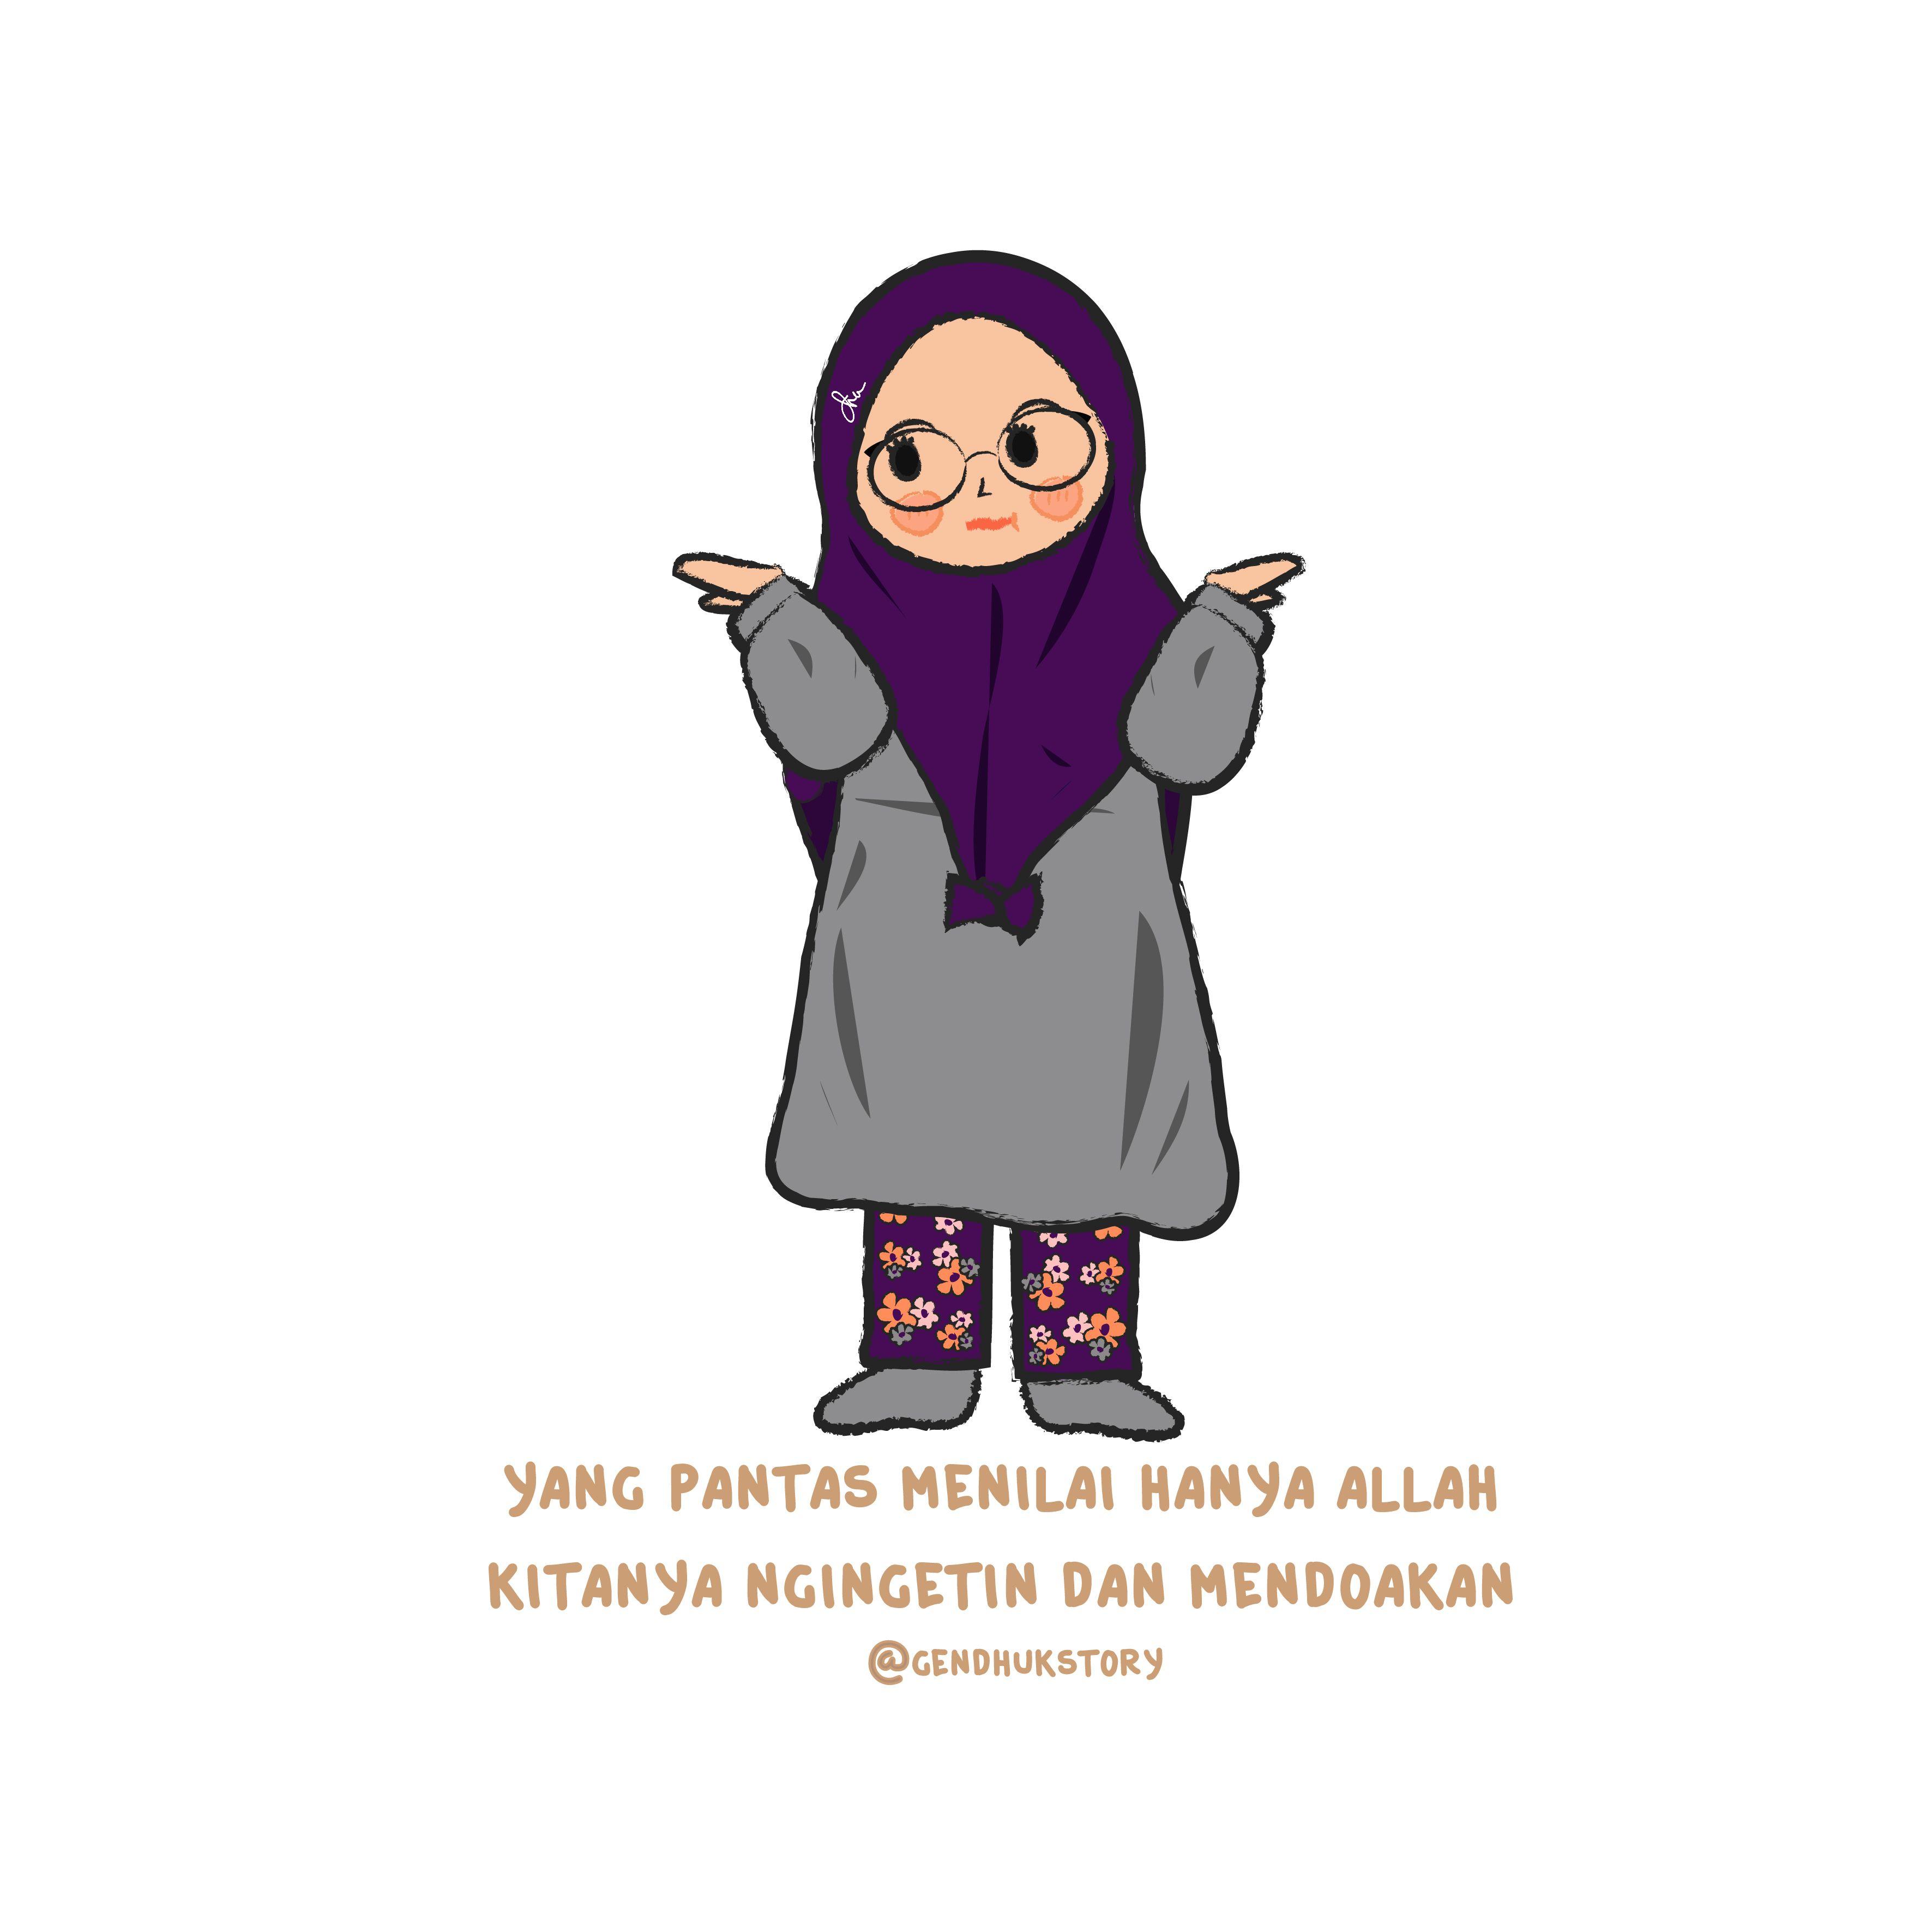 Cute illustration Gambar lucu, Kartun, Animasi